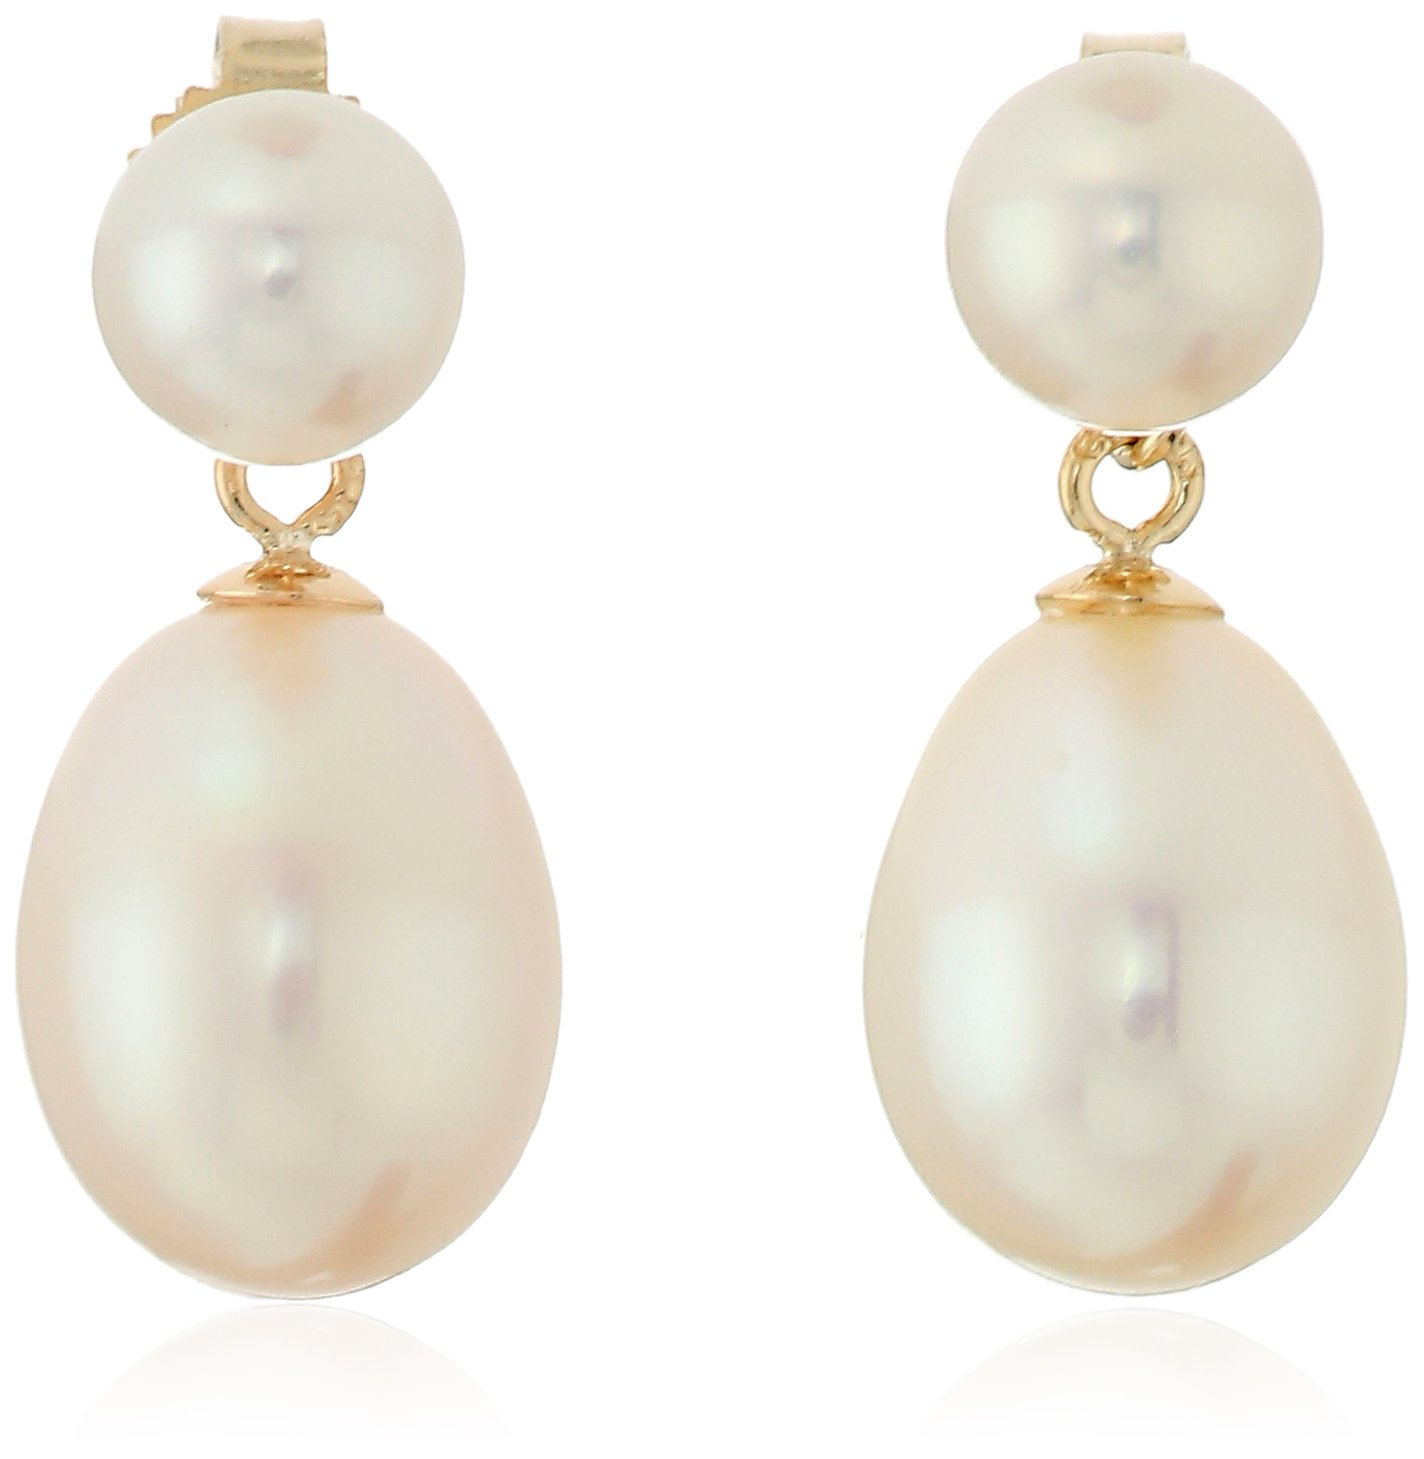 14k yellow gold 6.0-9.0mm cultured freshwater pearl drop earrings